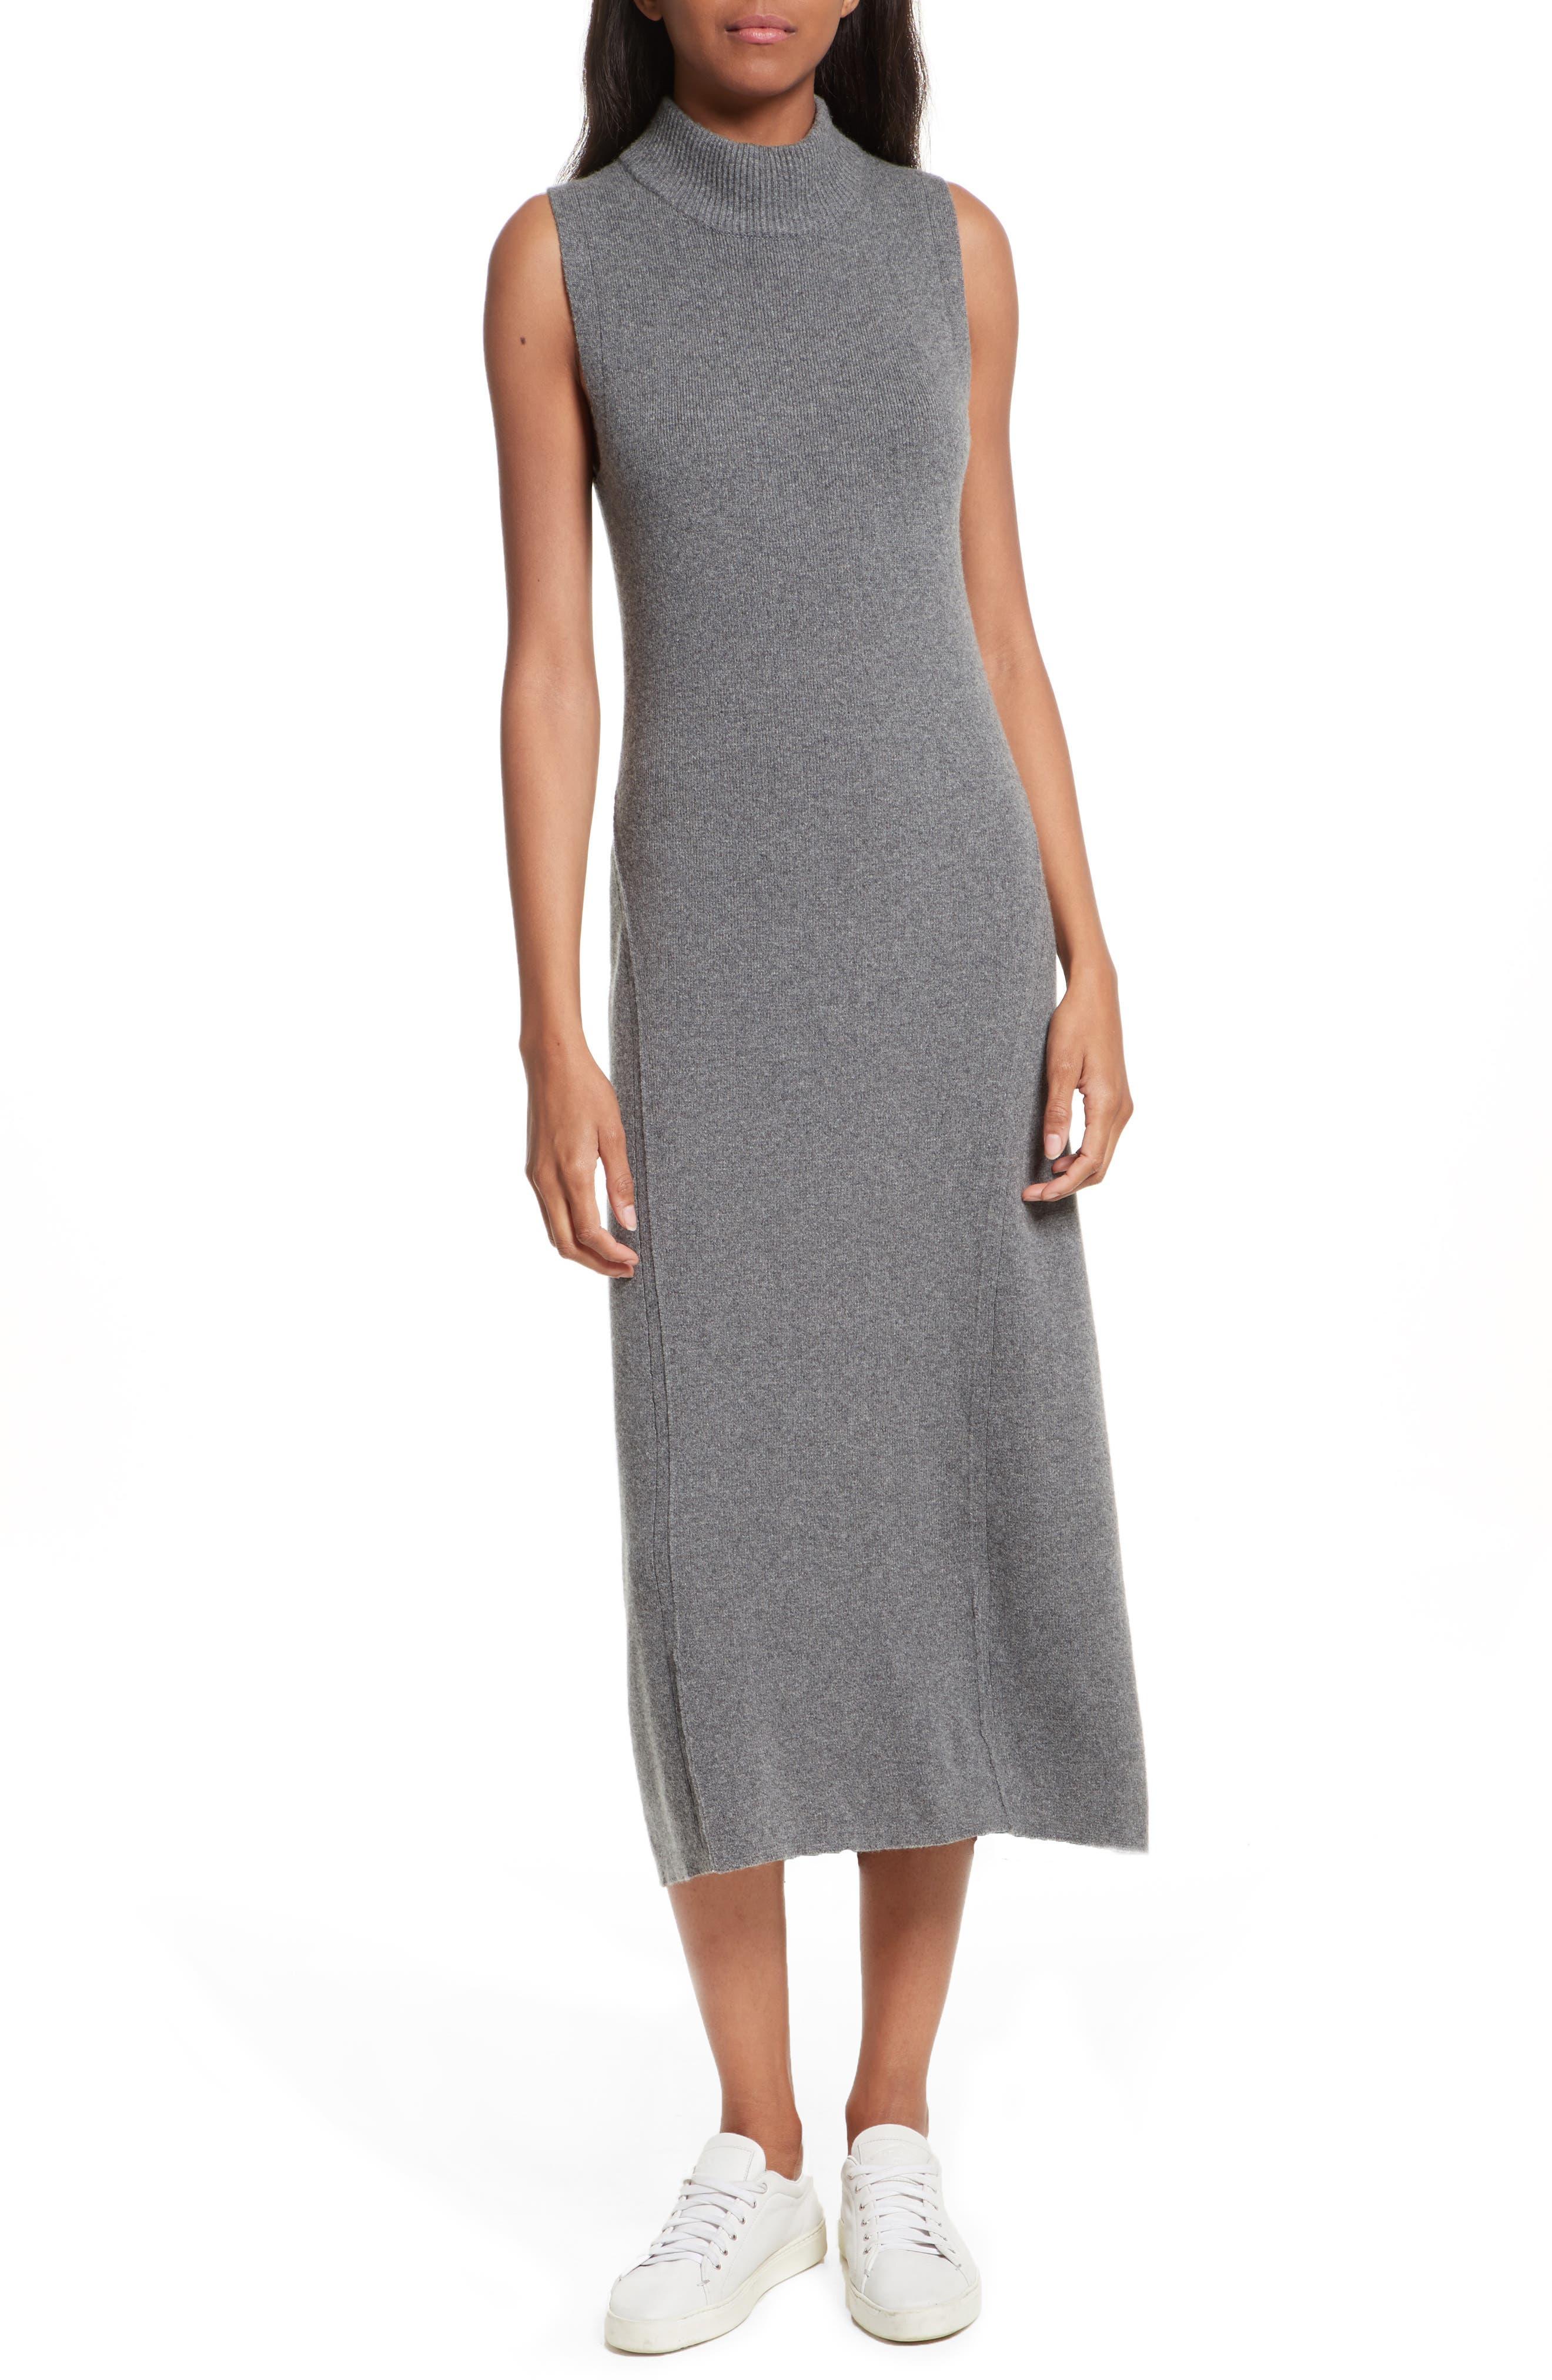 Ace Cashmere Mock Neck Sweater Dress,                         Main,                         color, Charcoal